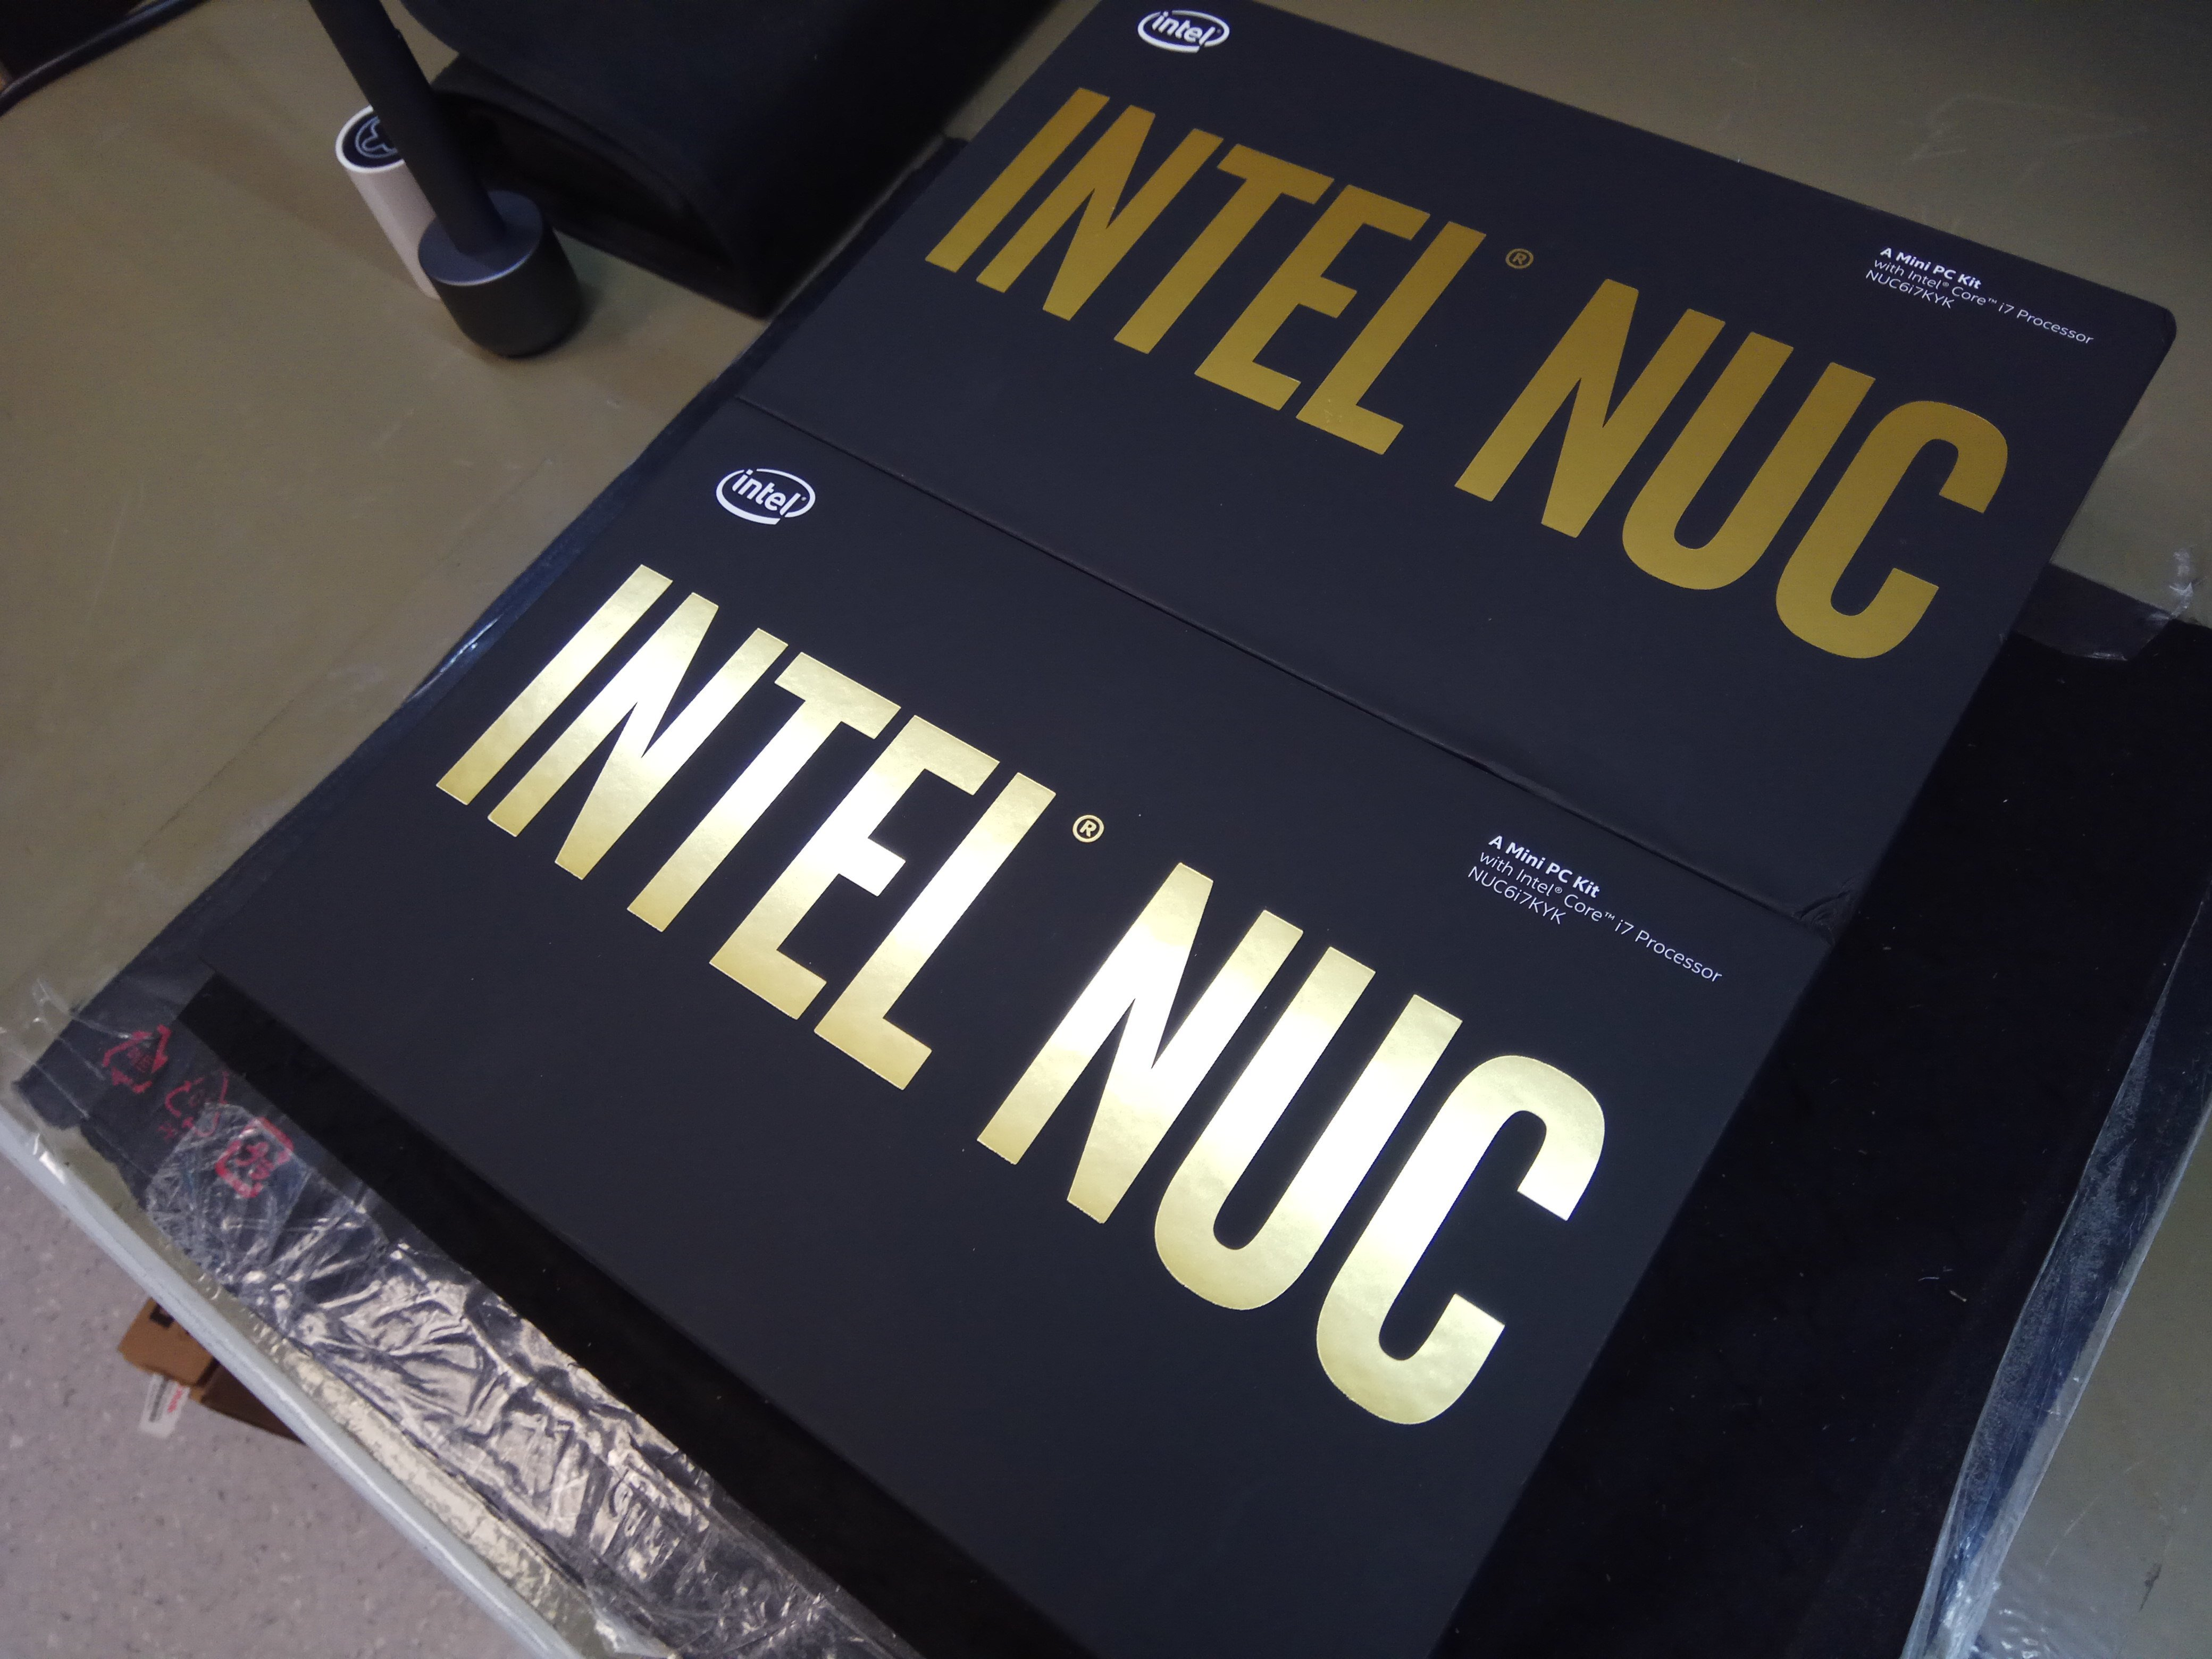 Intel NUC6i7KYK Teardown - iFixit